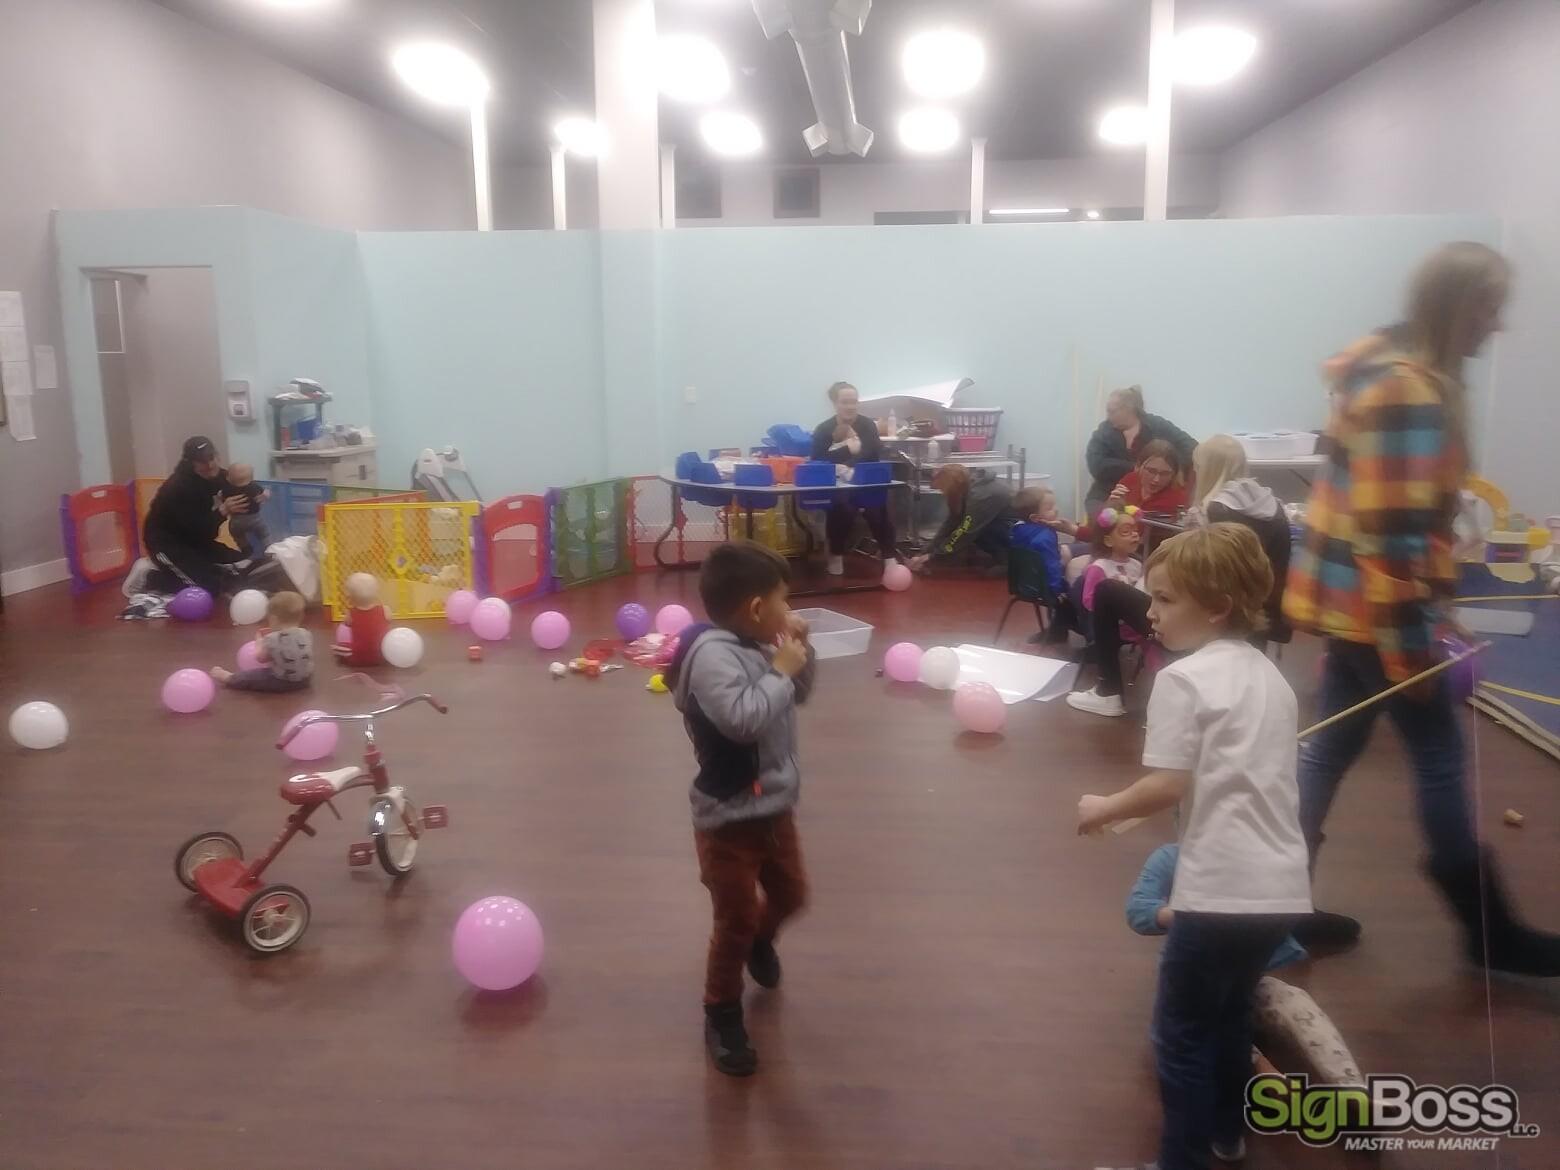 Scott's Toy Box Childcare in Gillette WY